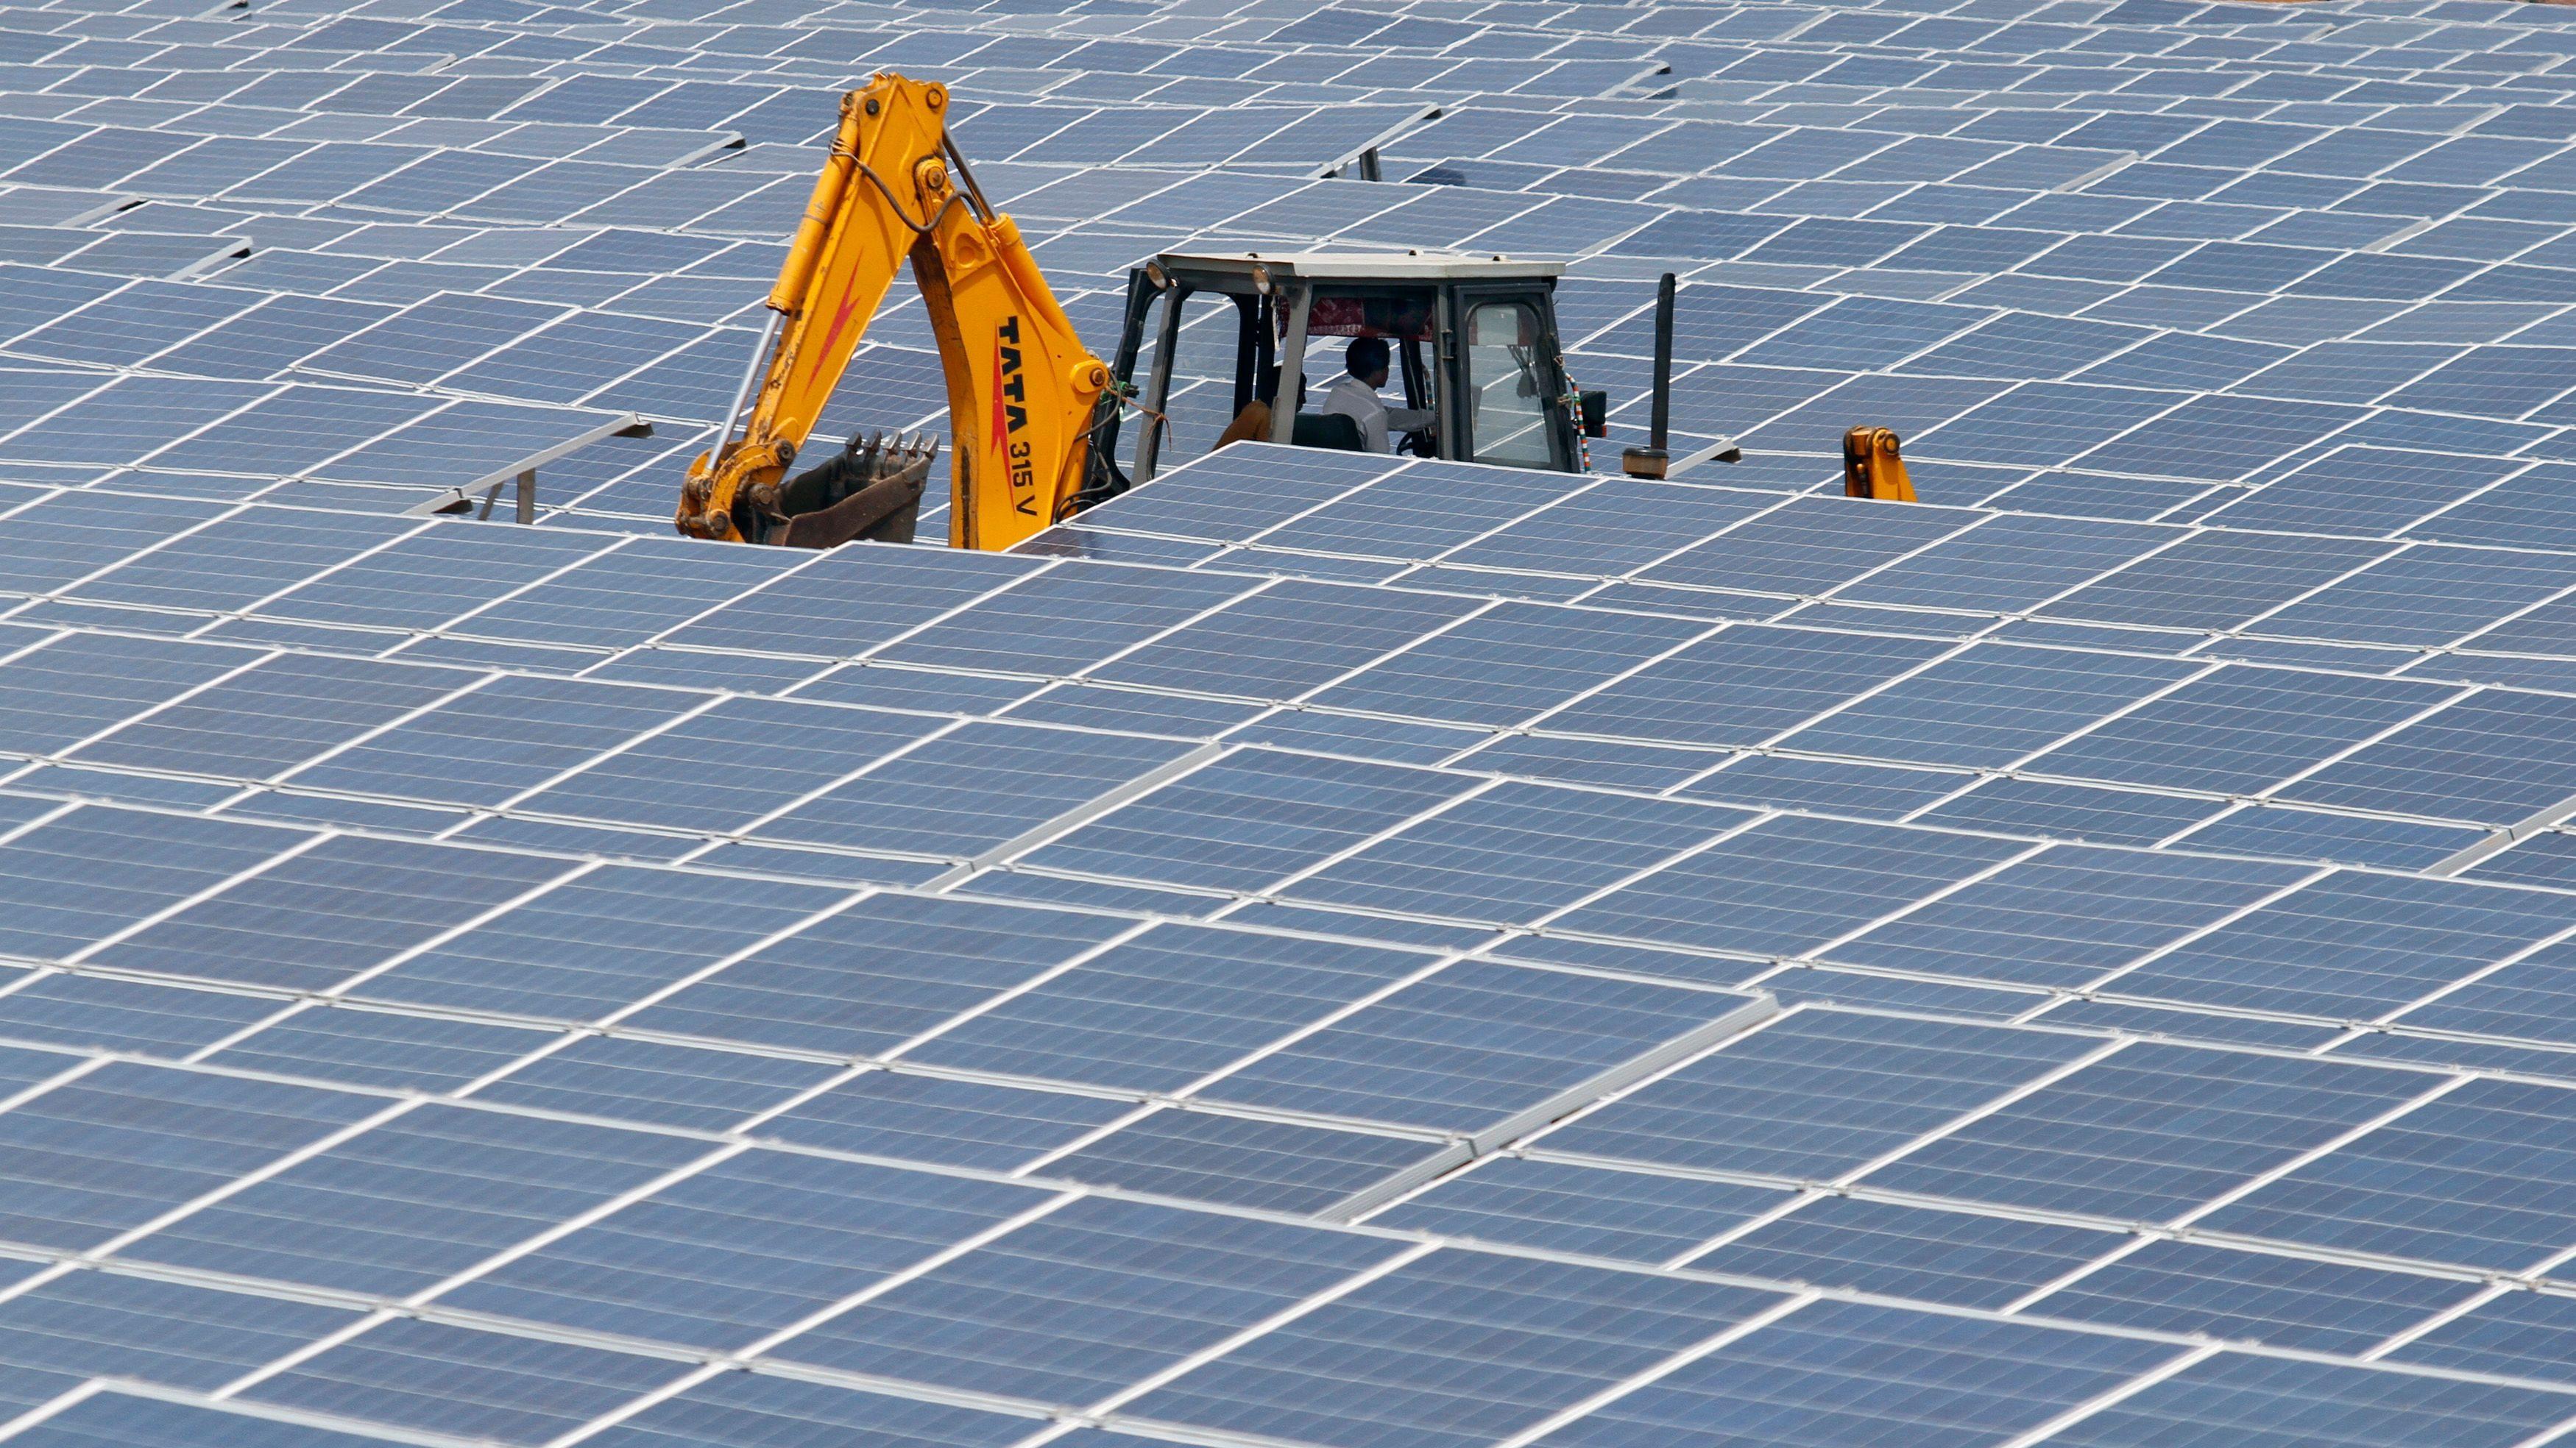 Indias Solar Power Boom Trips On Policy Hurdles Quartz India